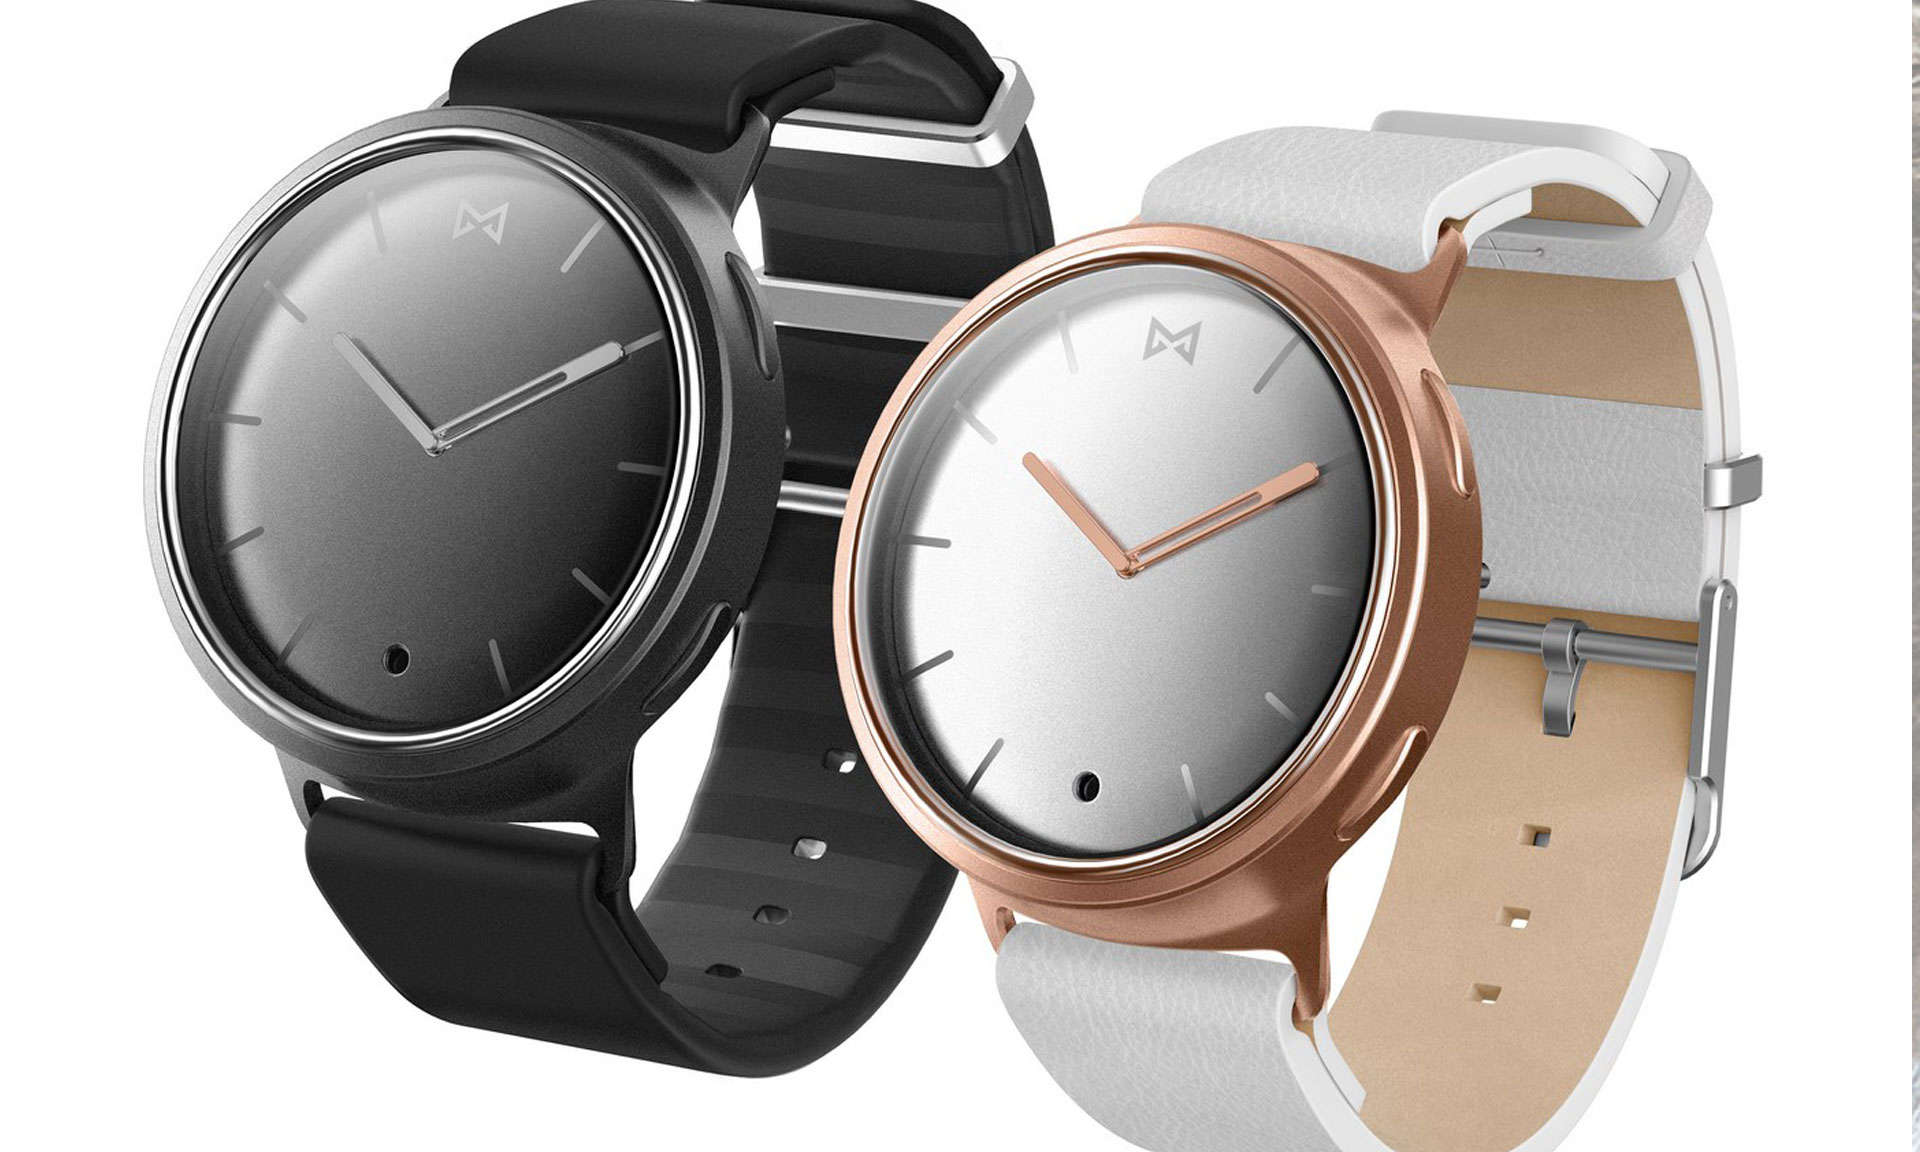 Misfit Analog Smartwatch